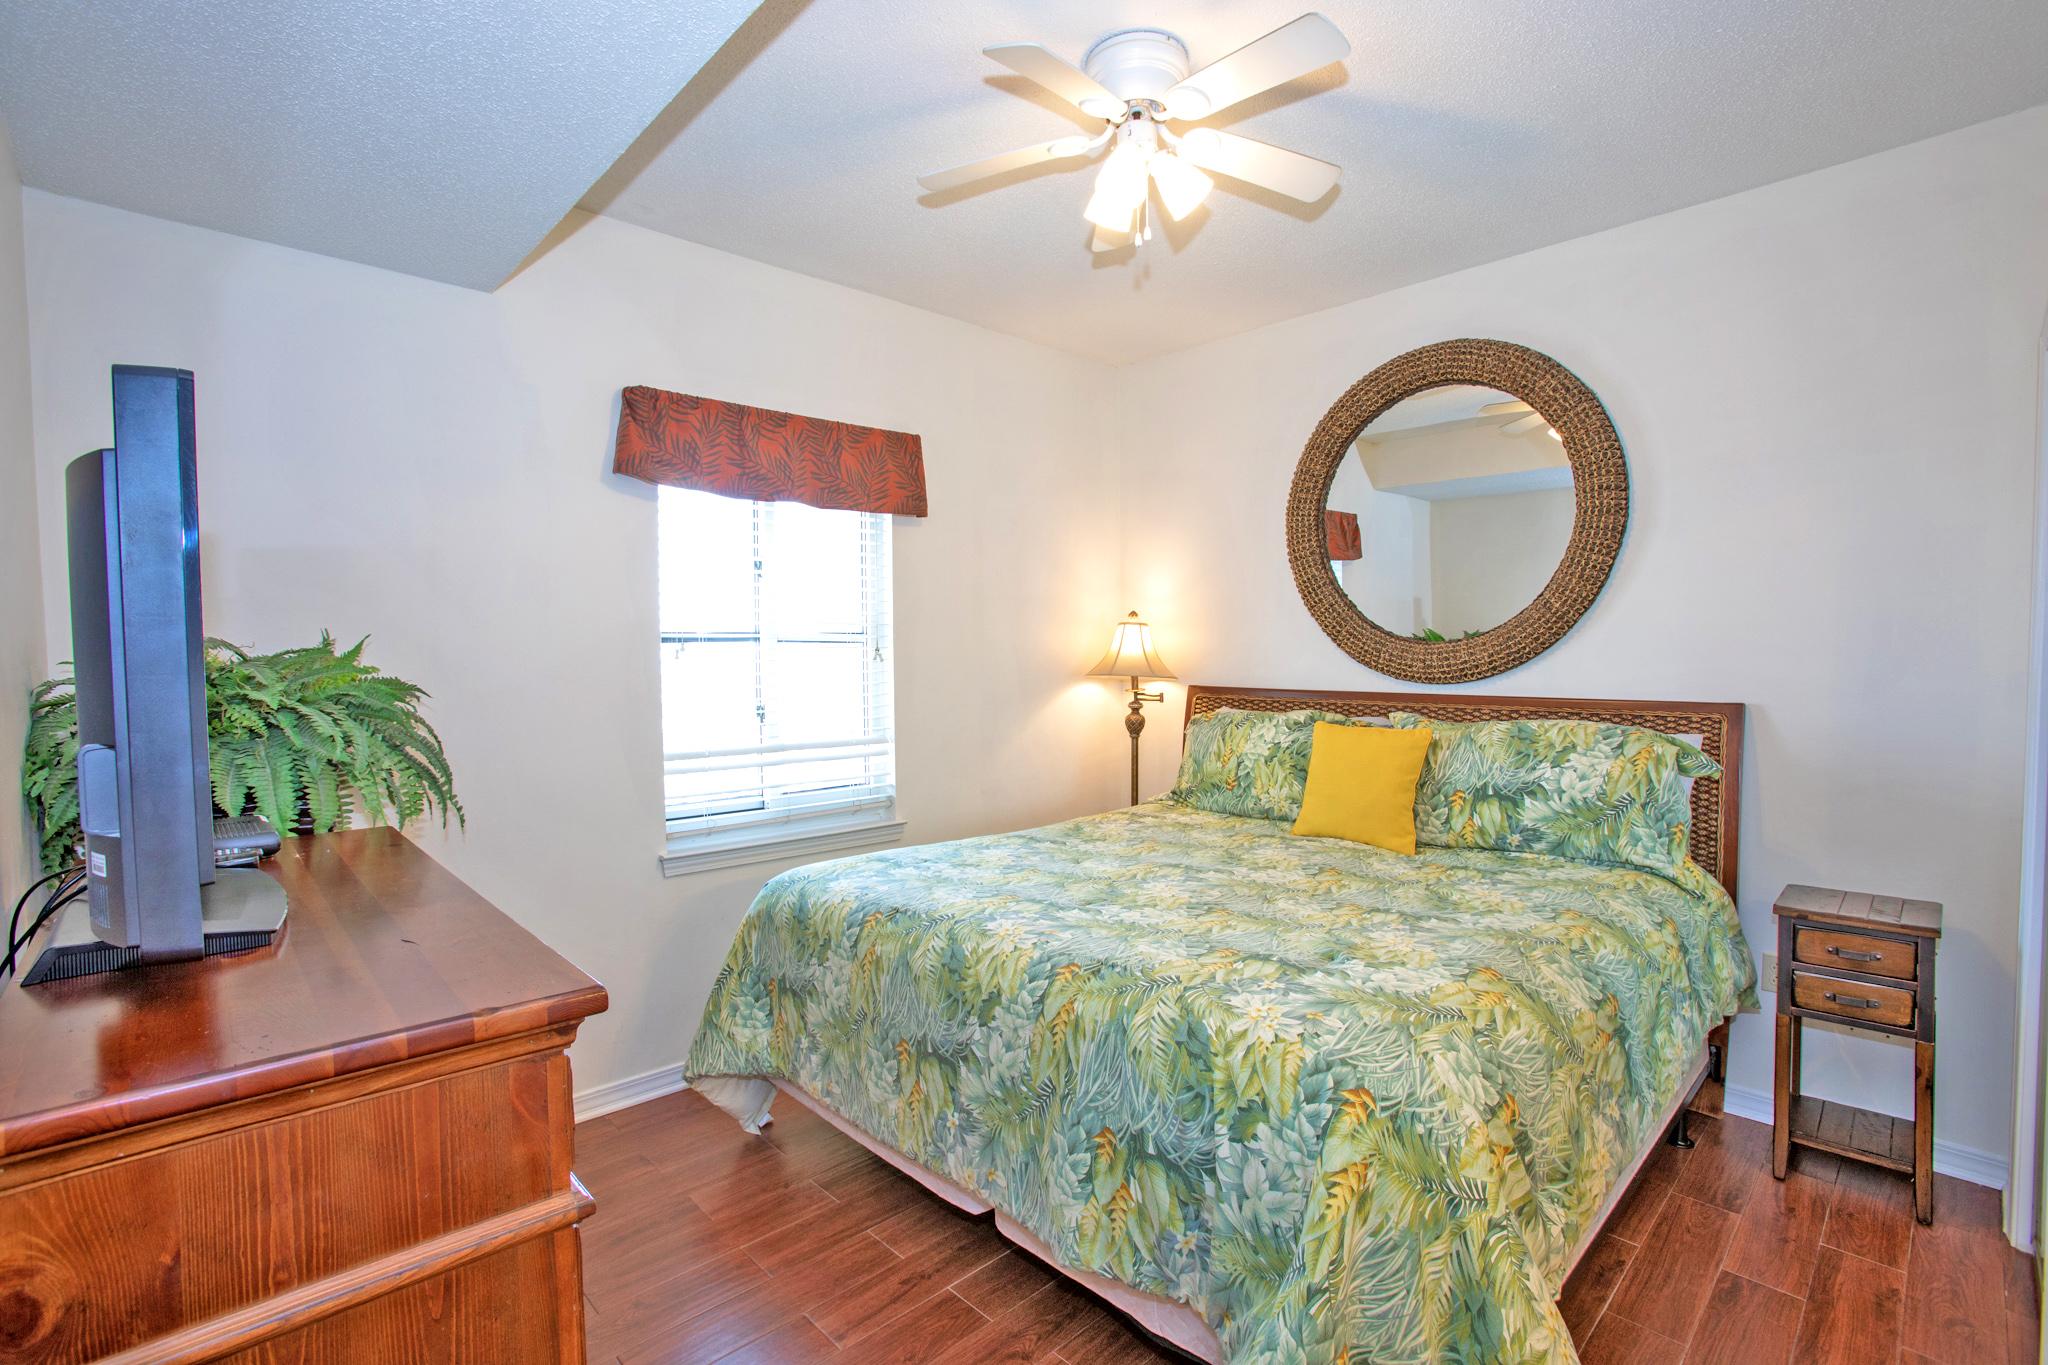 South Harbour #7E Condo rental in South Harbour ~ Pensacola Beach Vacation Rentals by BeachGuide in Pensacola Beach Florida - #7